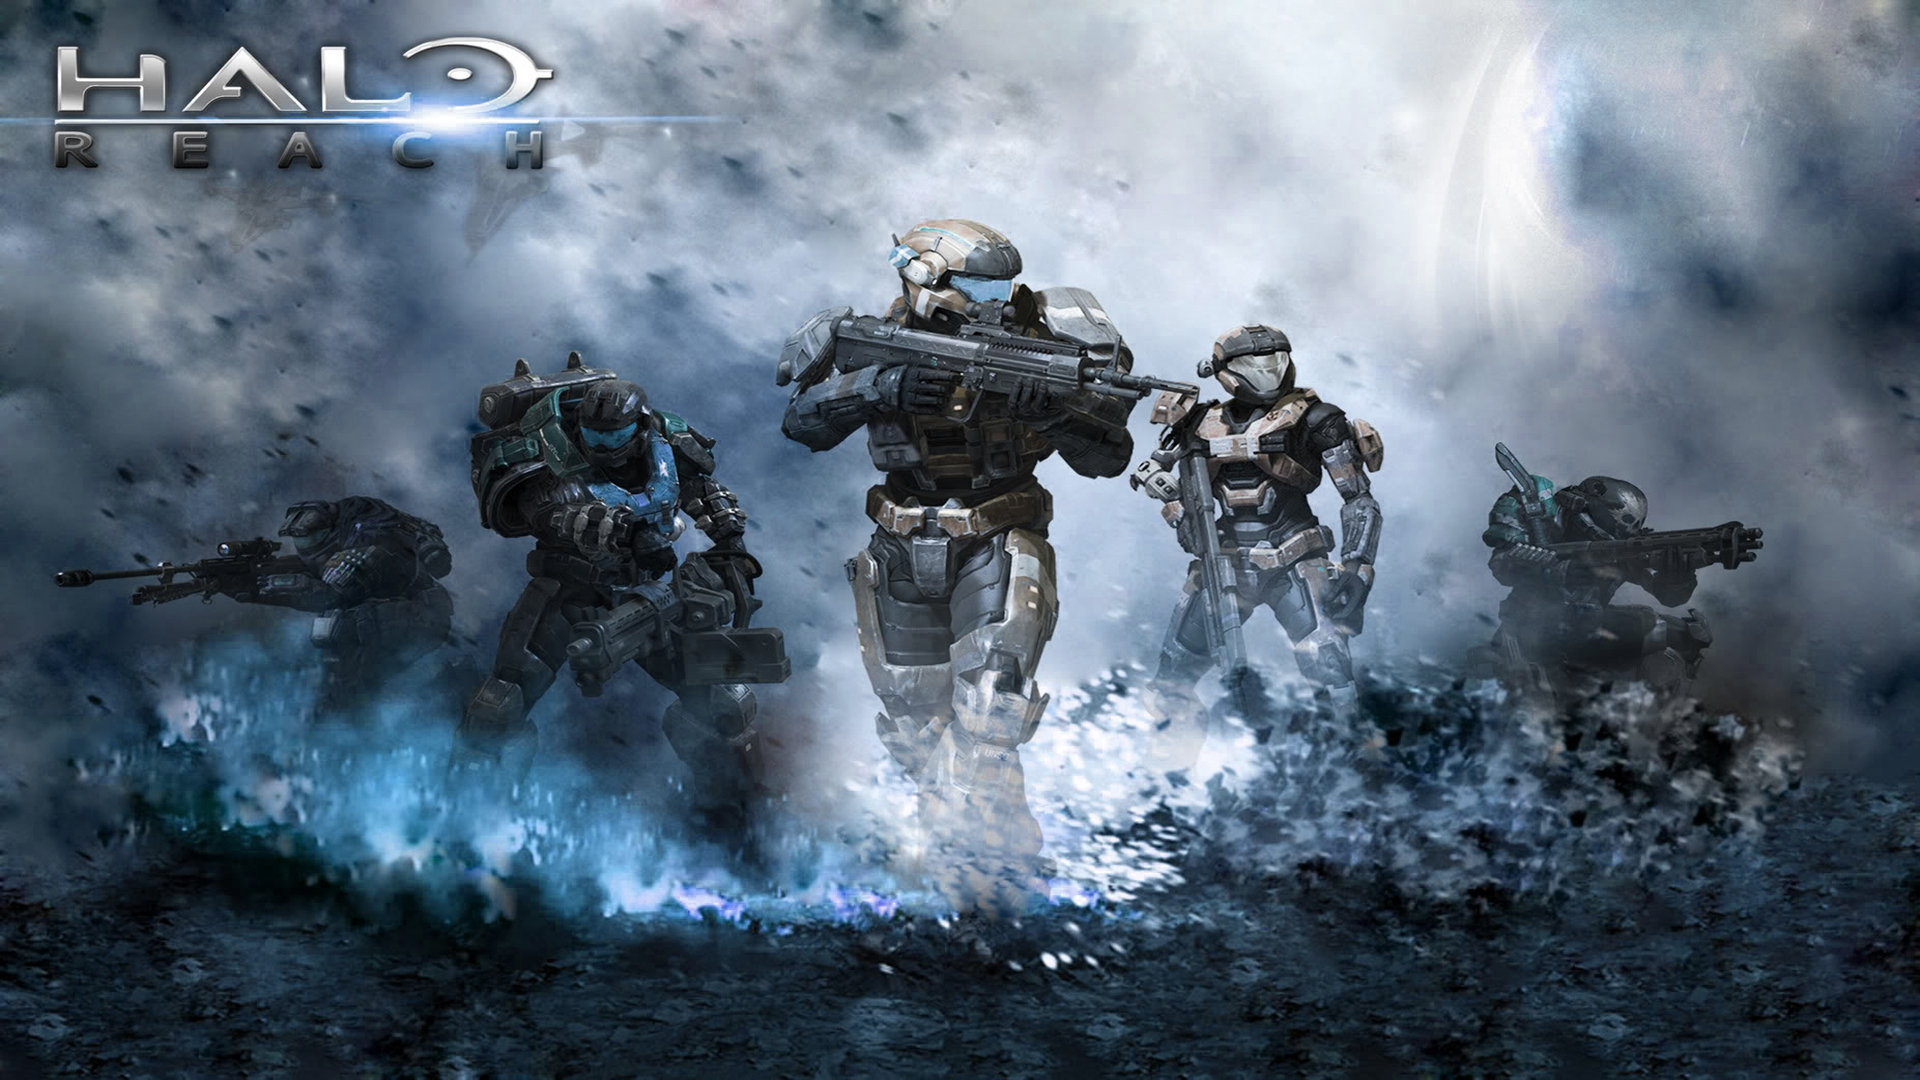 Halo Wallpaper HD download 1920x1080